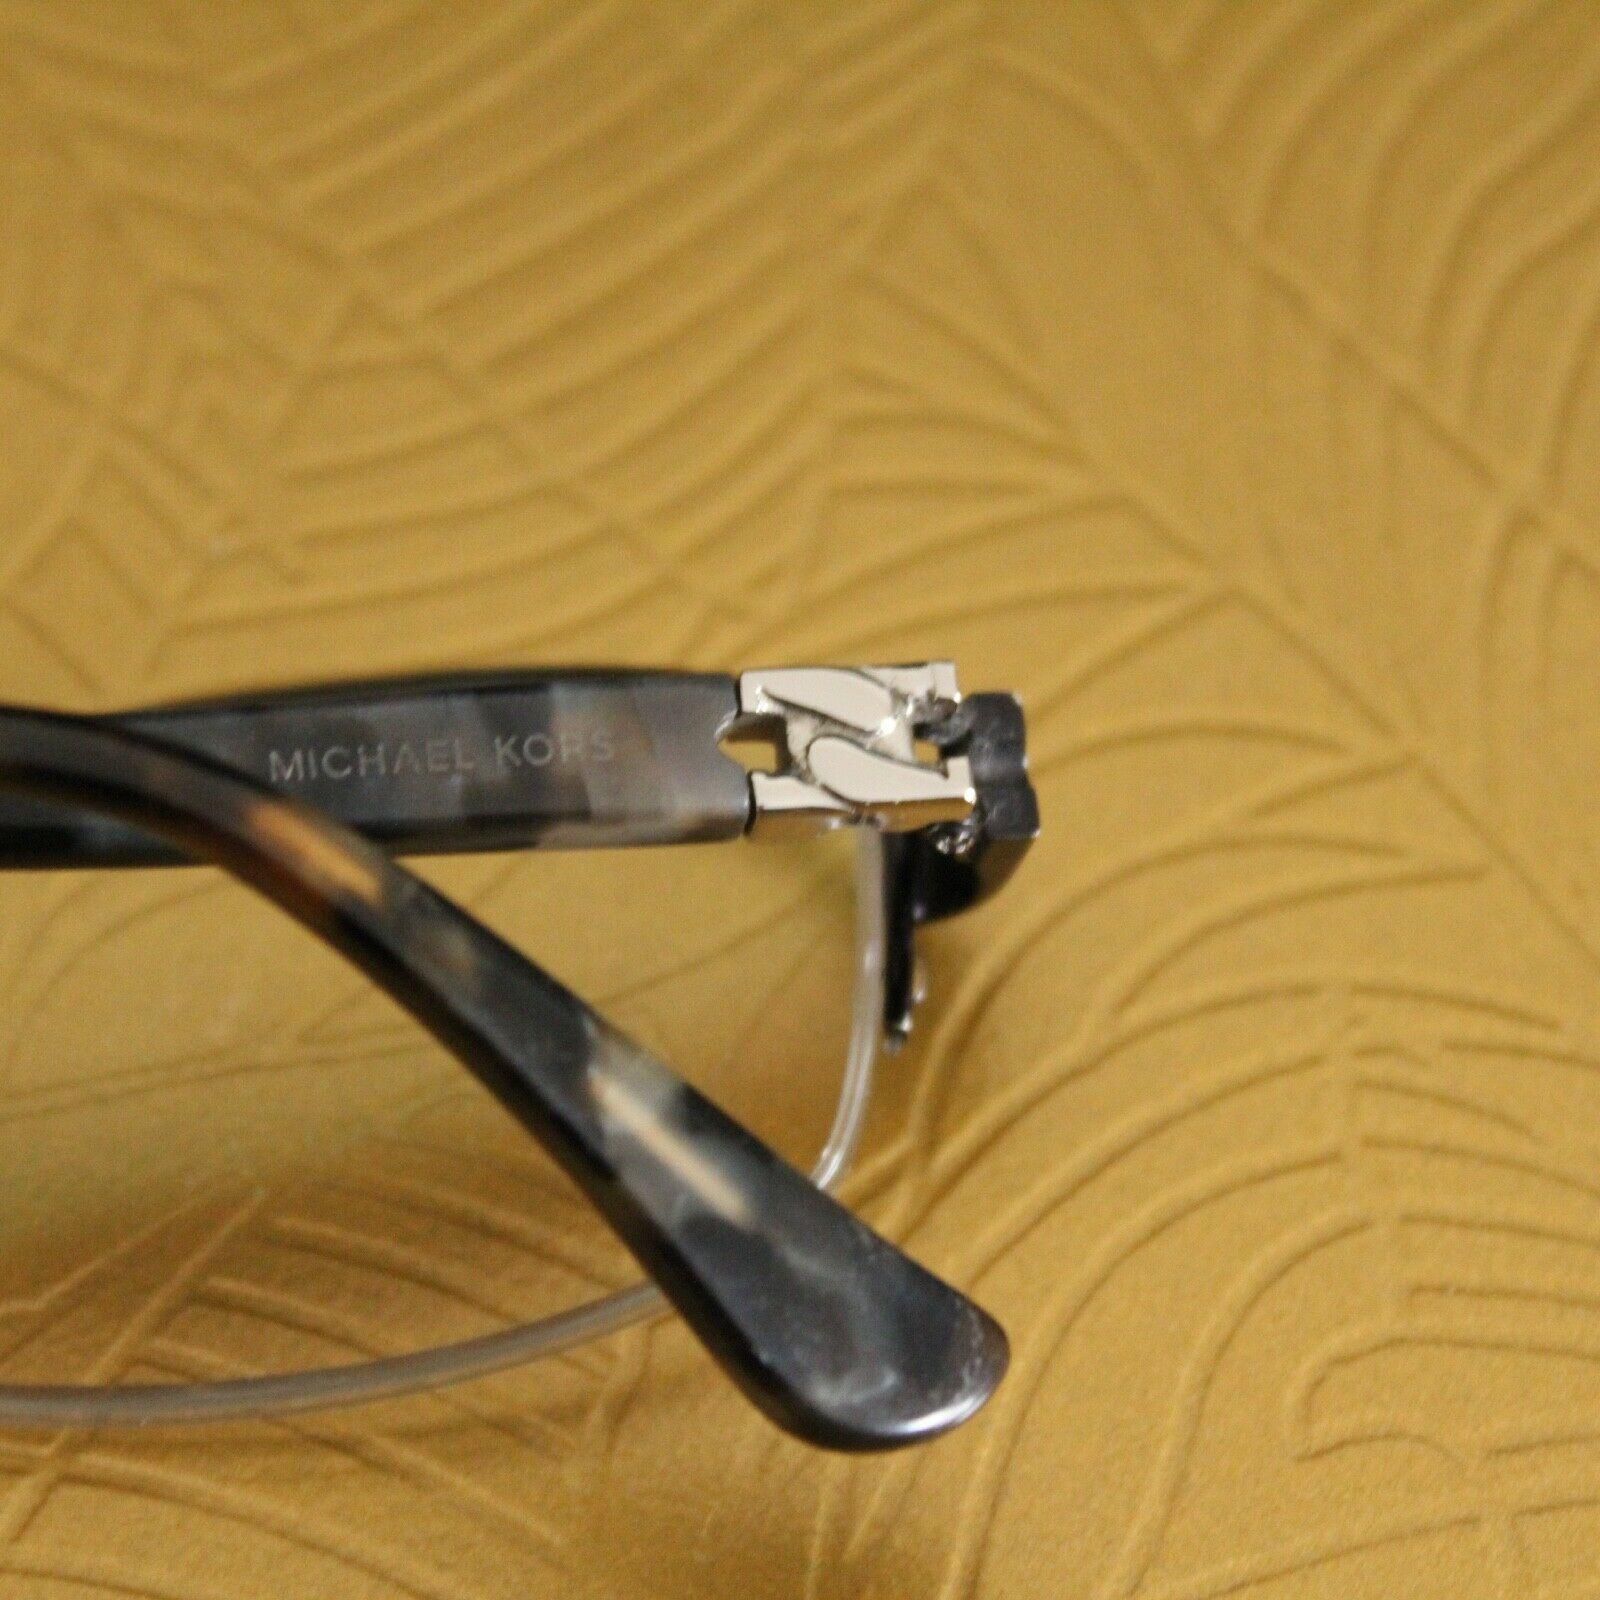 Michael Kors MK 494 001 Semi Rimless Black Marble RX Eyeglasses Frames 51 17 135